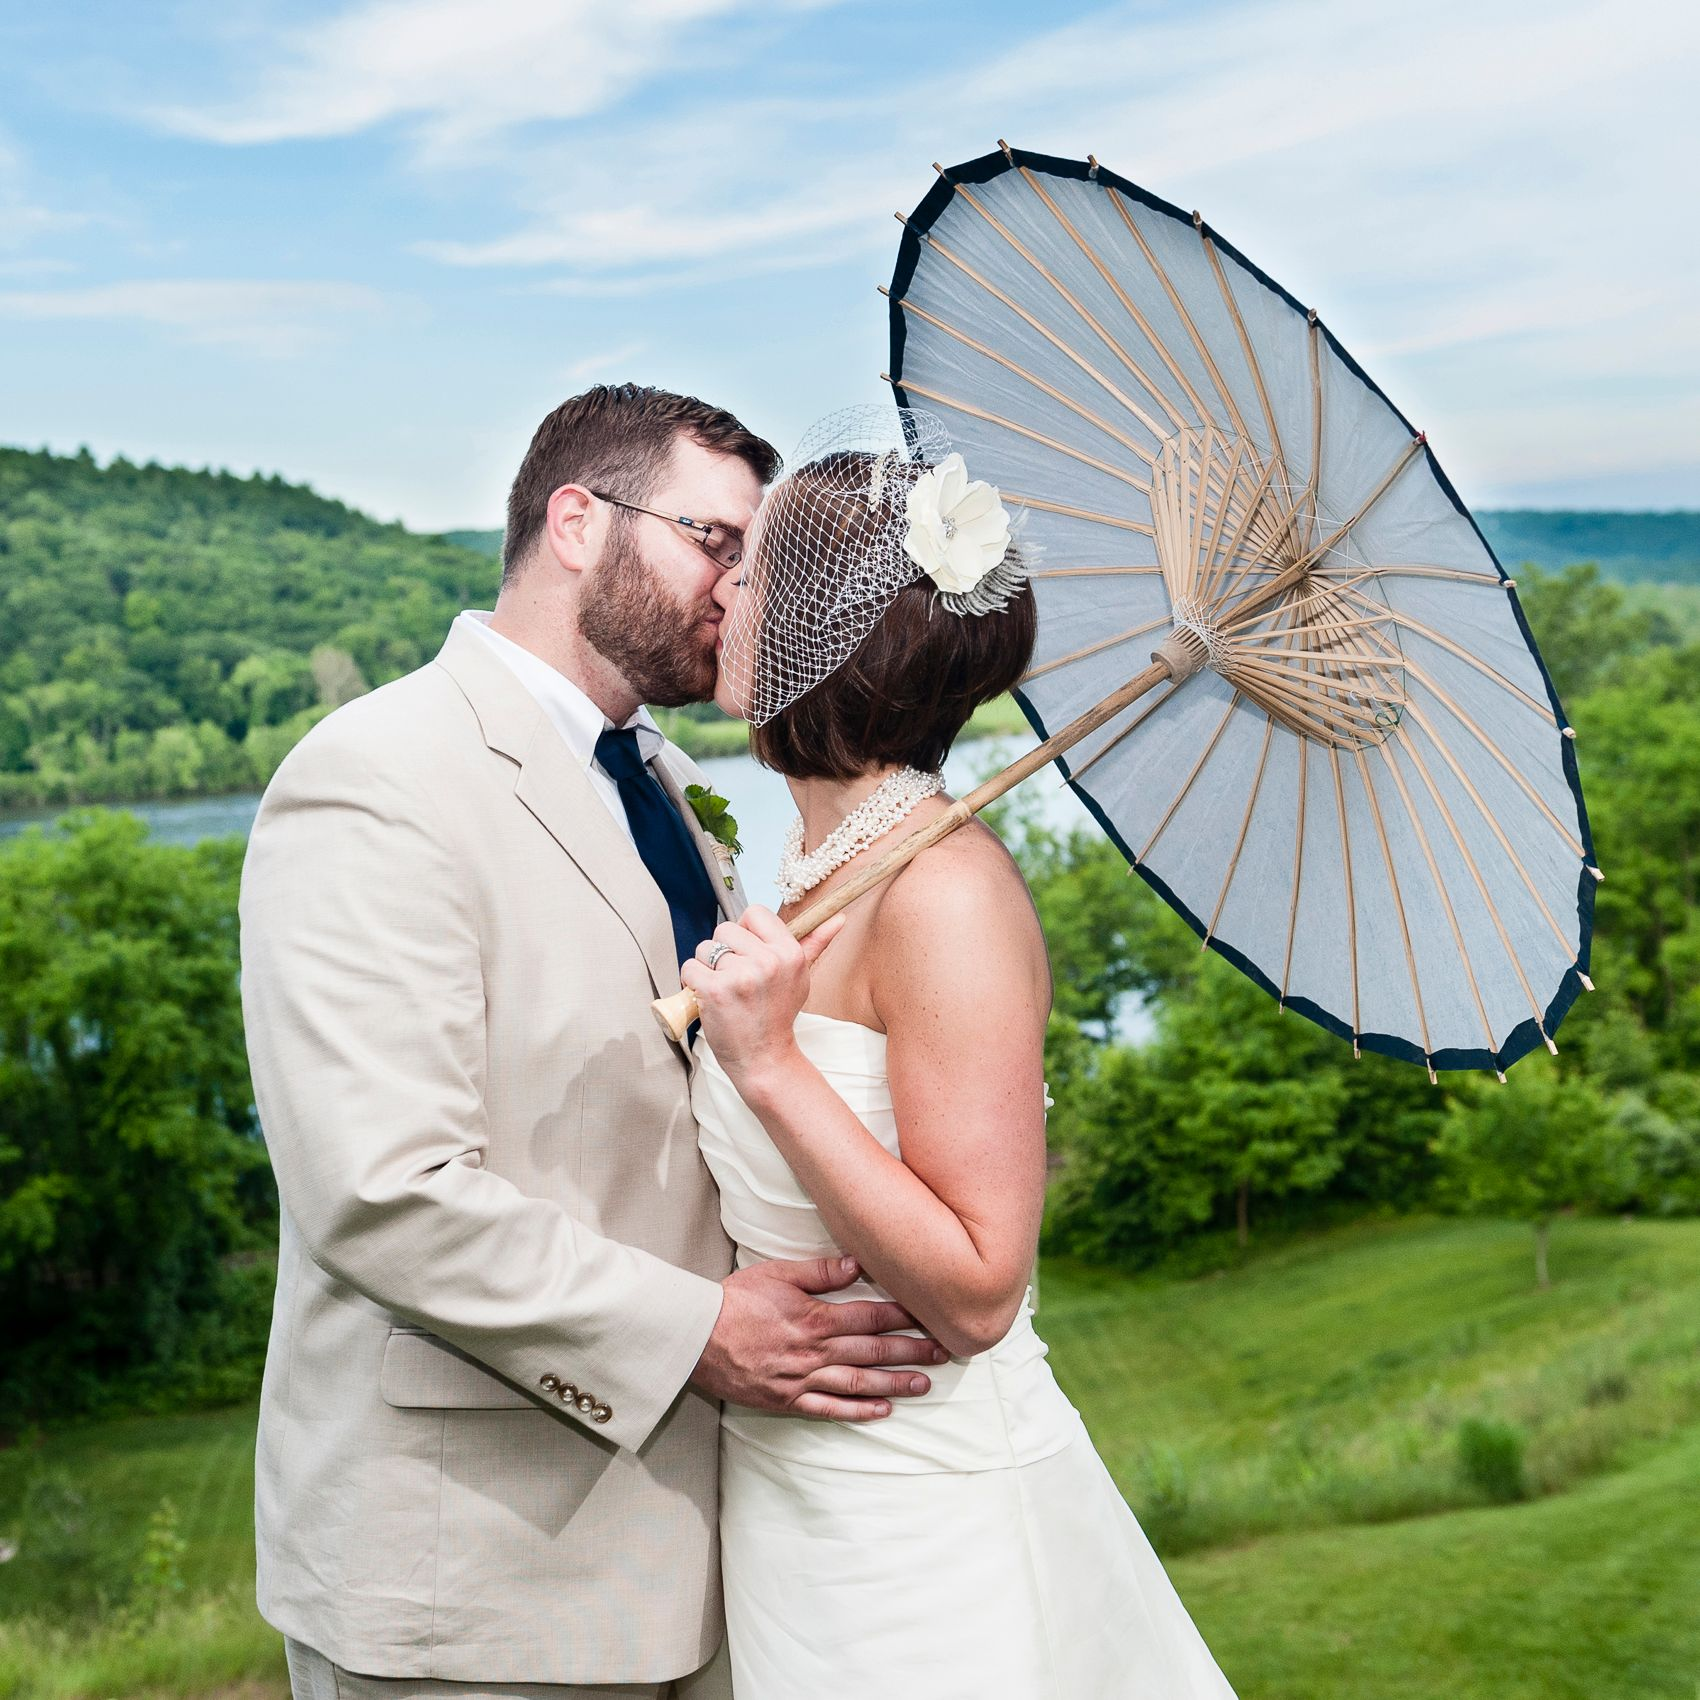 West_Hartford_Connecticut_Wedding_Photography-194.jpg